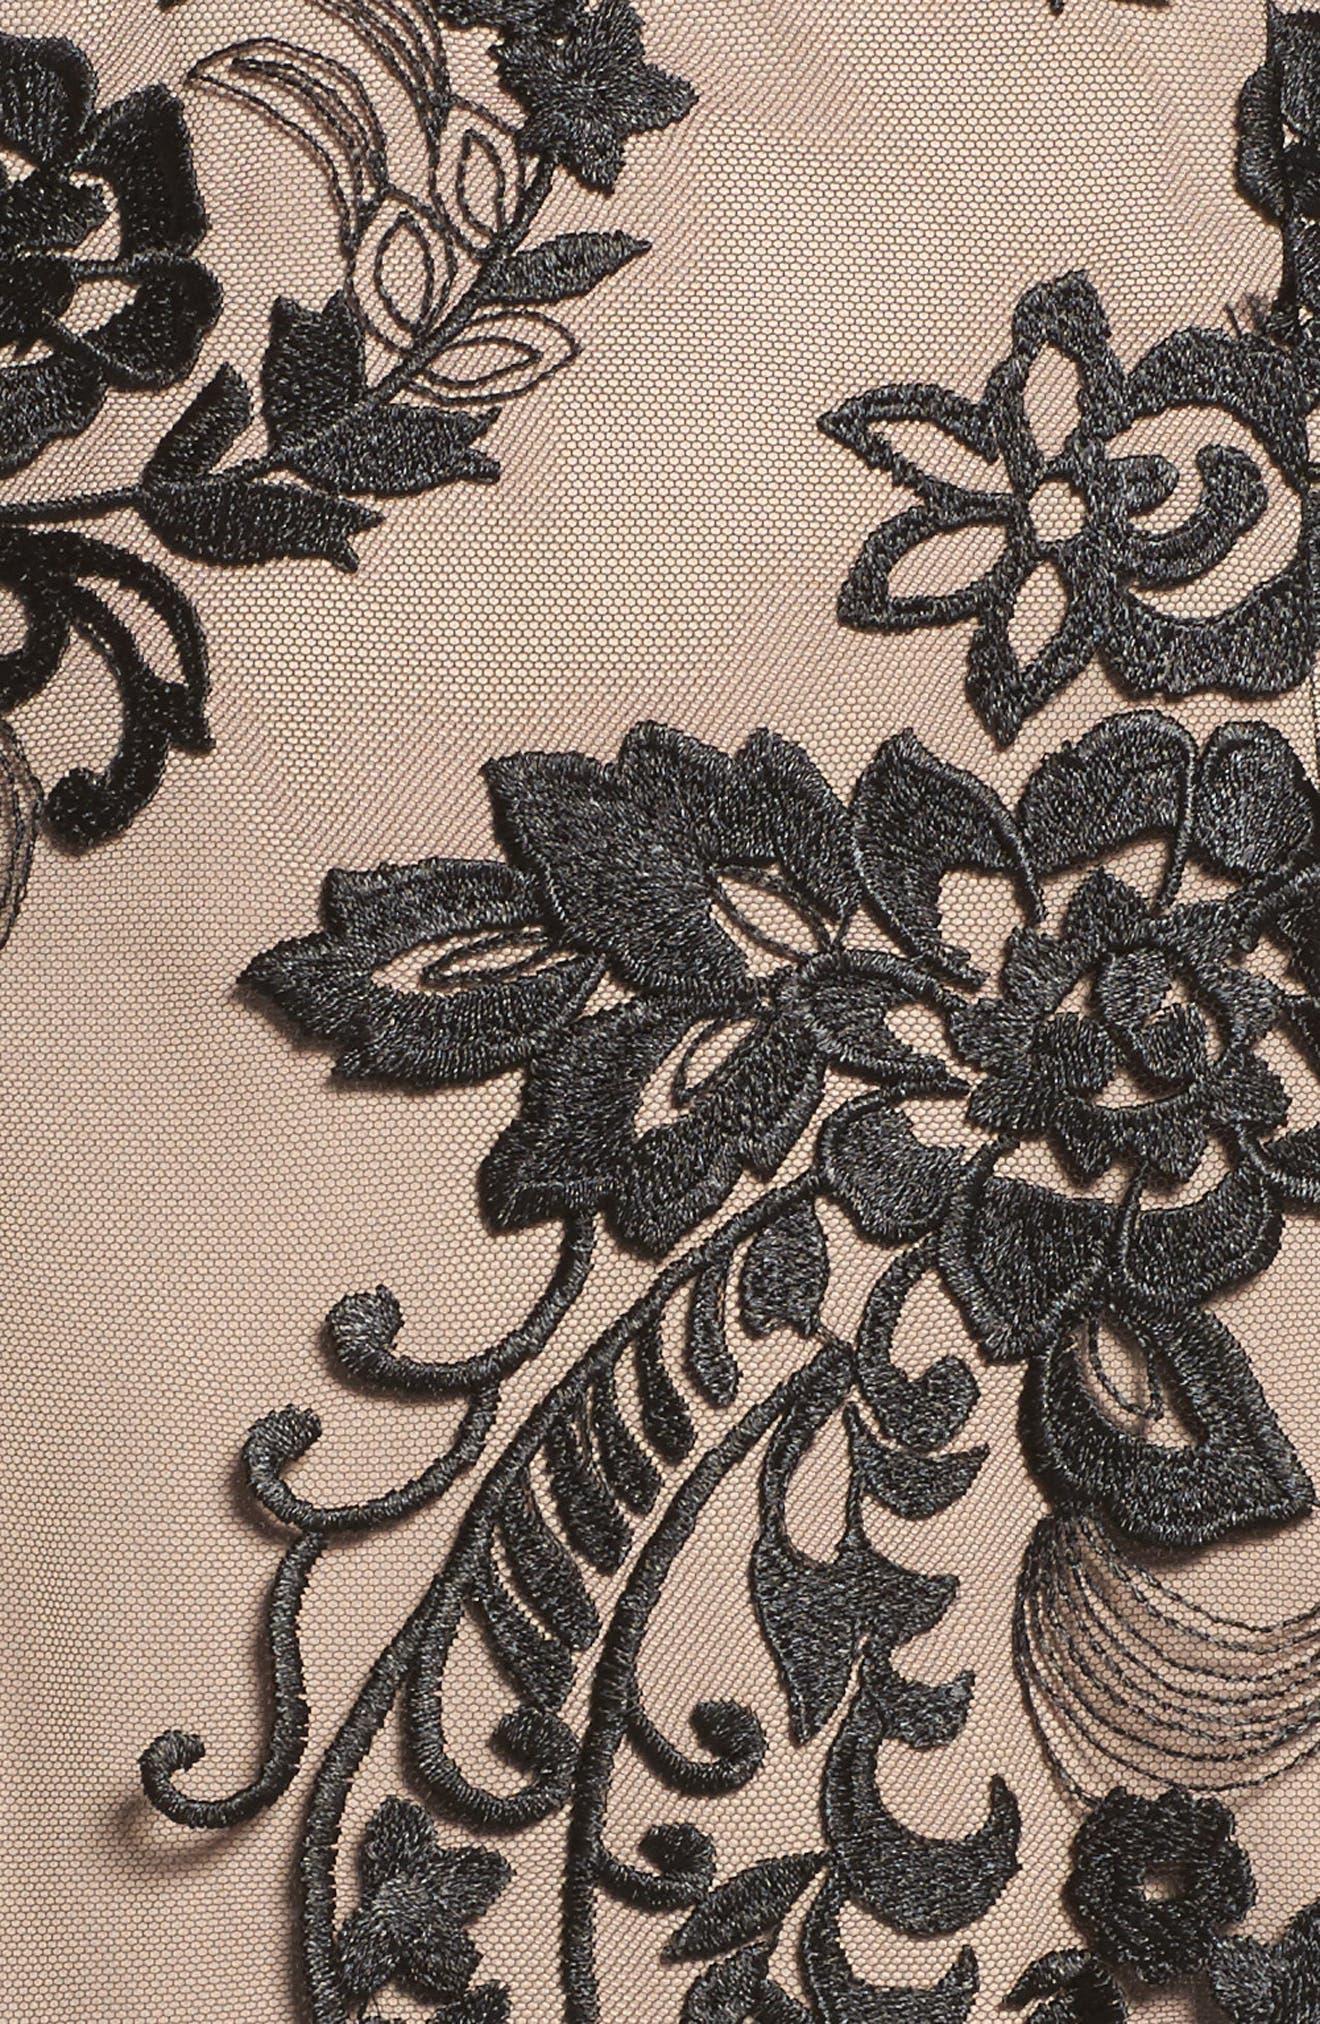 Eillen Embroidered Lace Dress,                             Alternate thumbnail 5, color,                             017